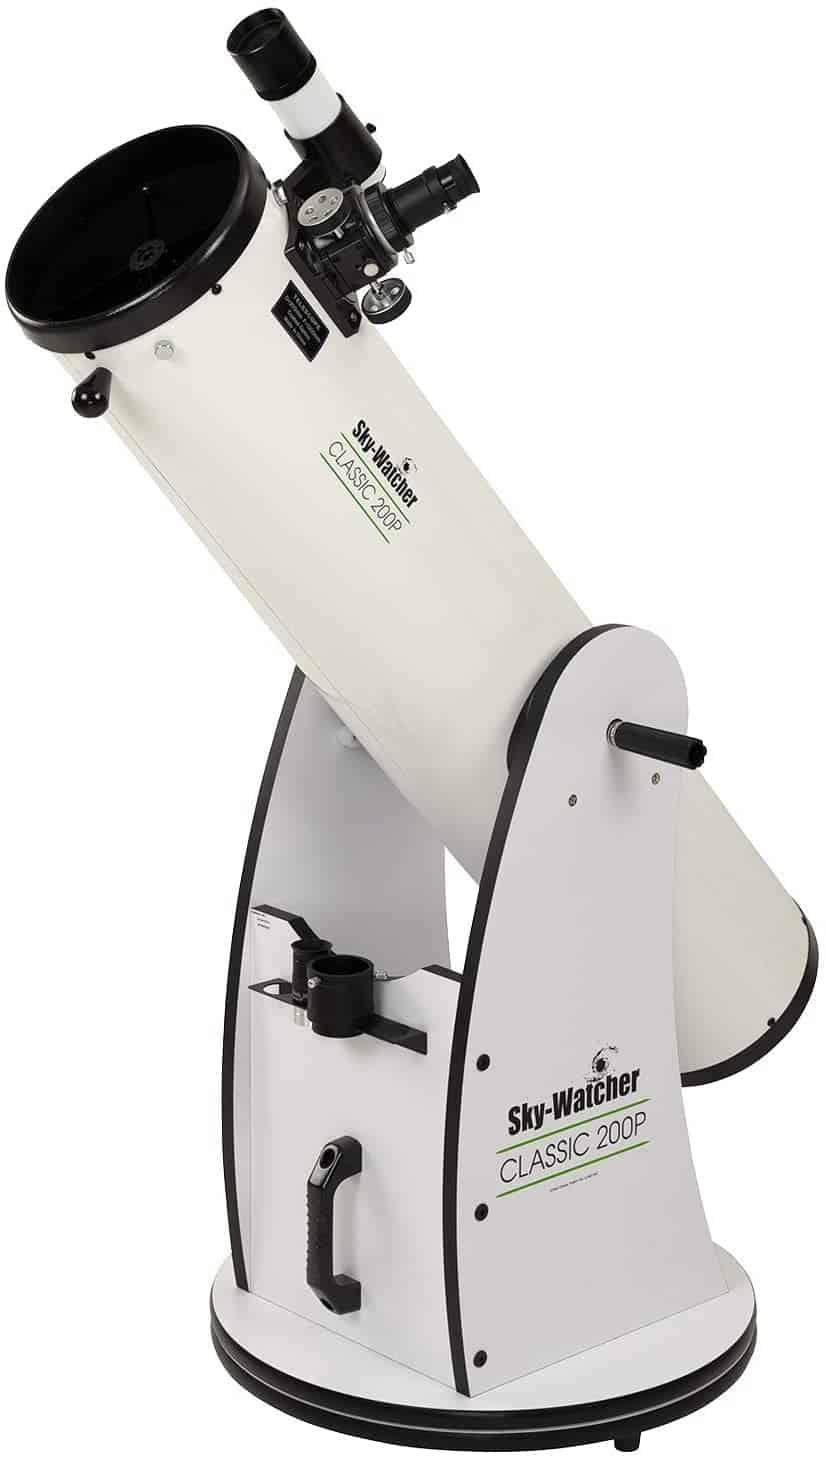 Sky-Watcher Classic Dobsonian Telescope